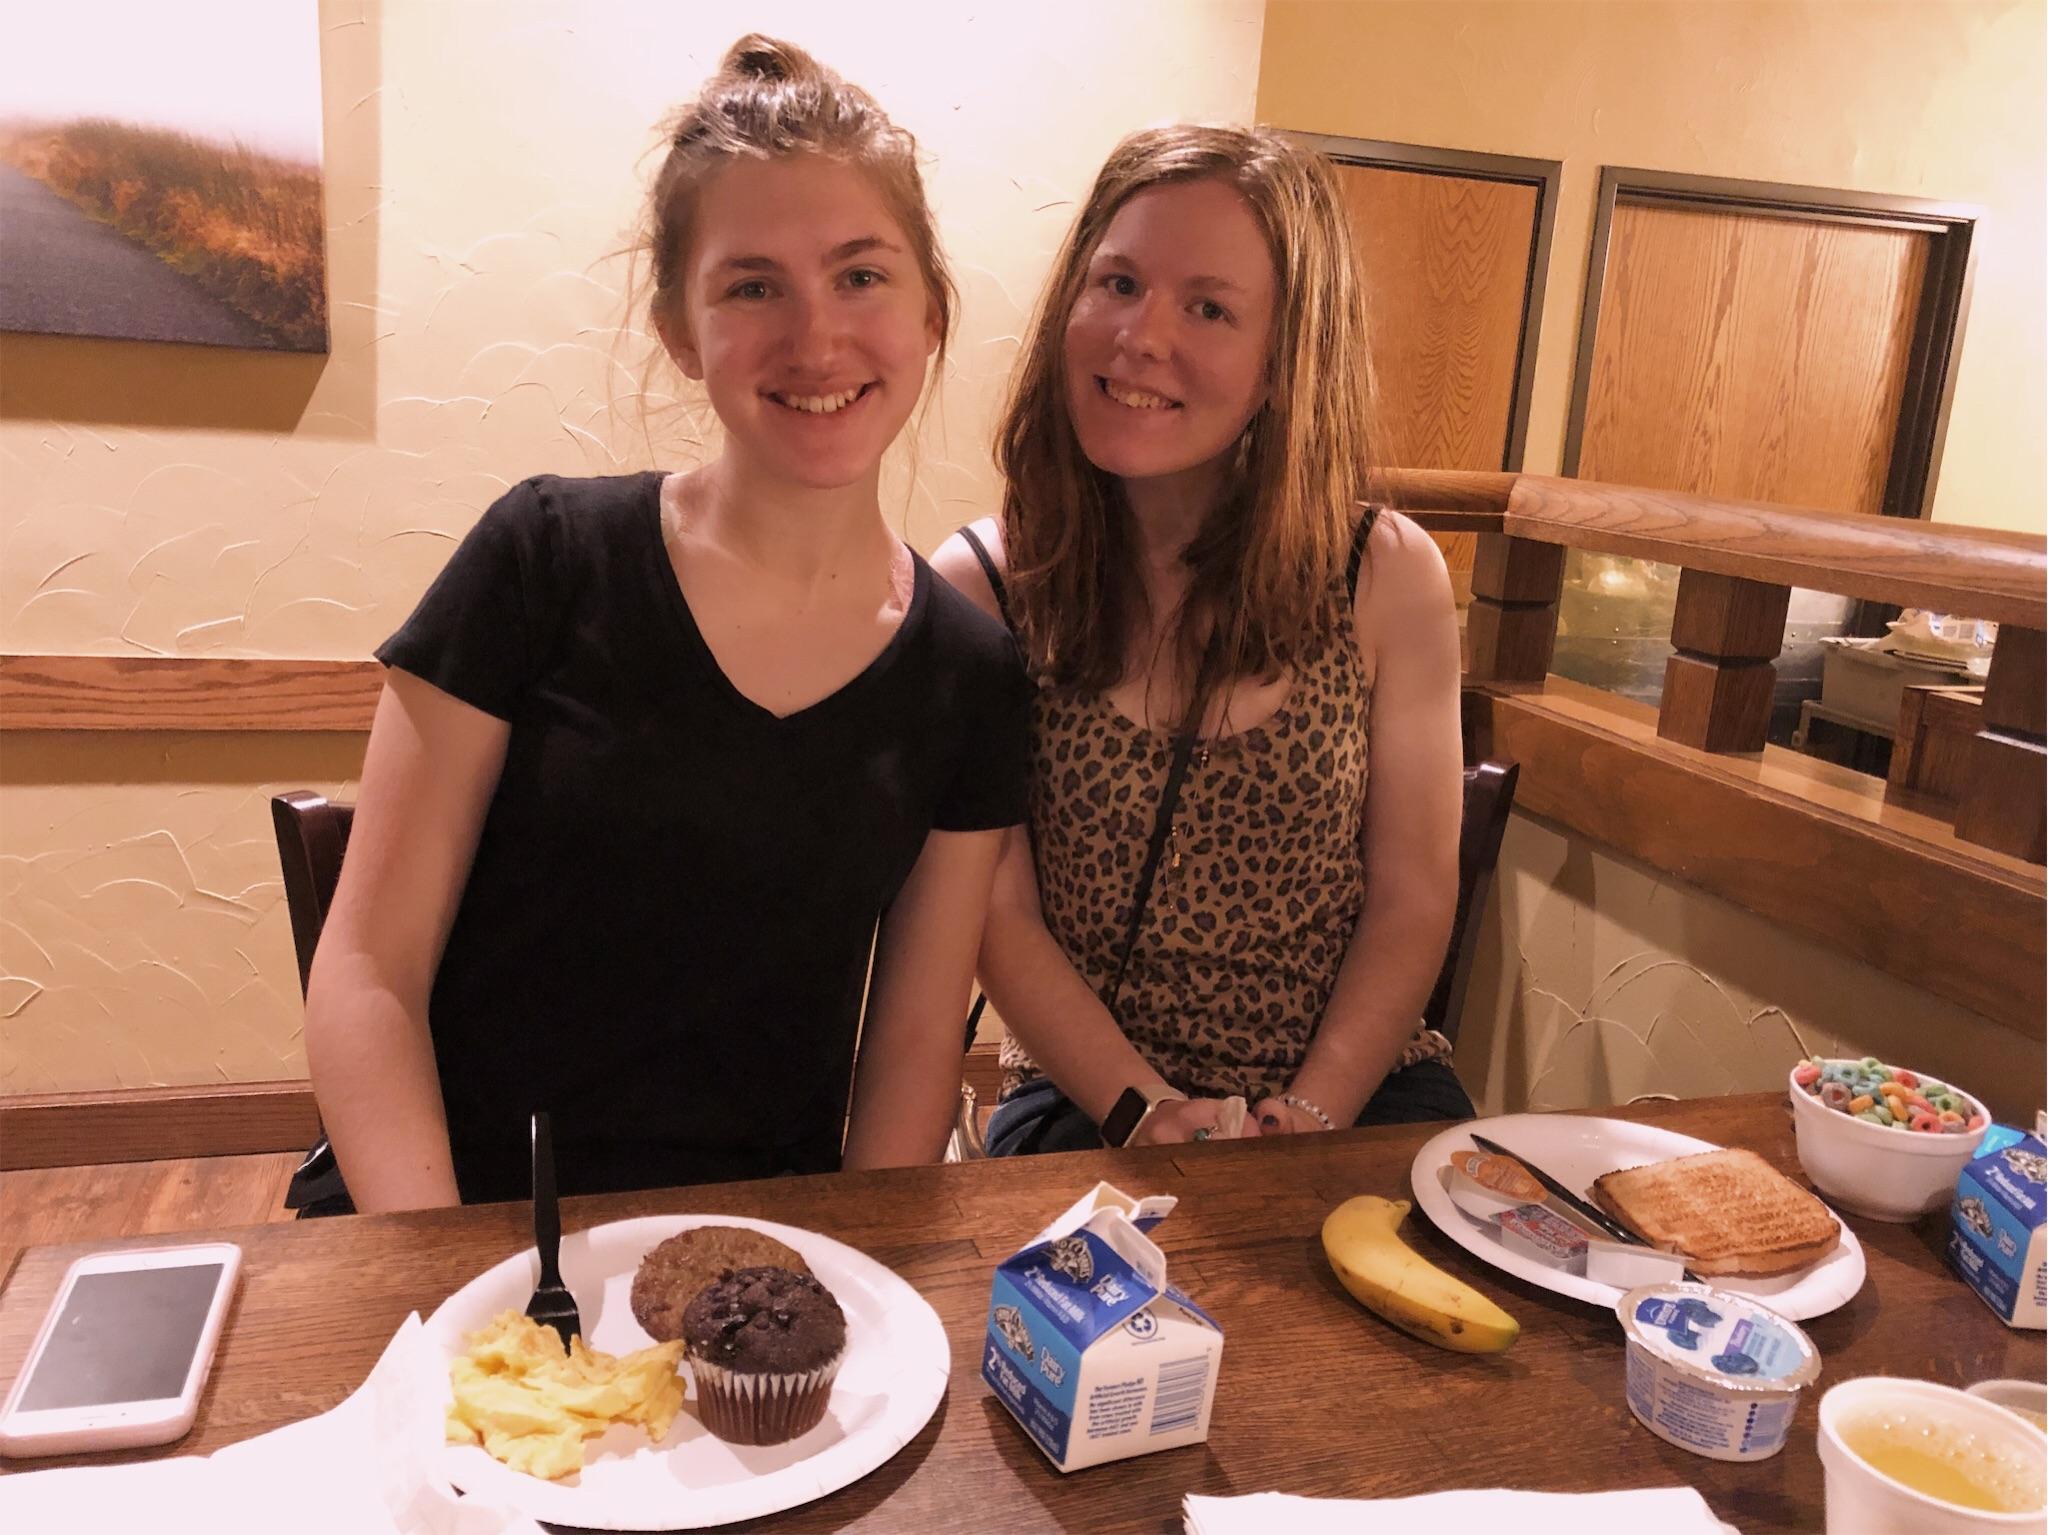 ashlee-kirsten-hotel-breakfast.jpg